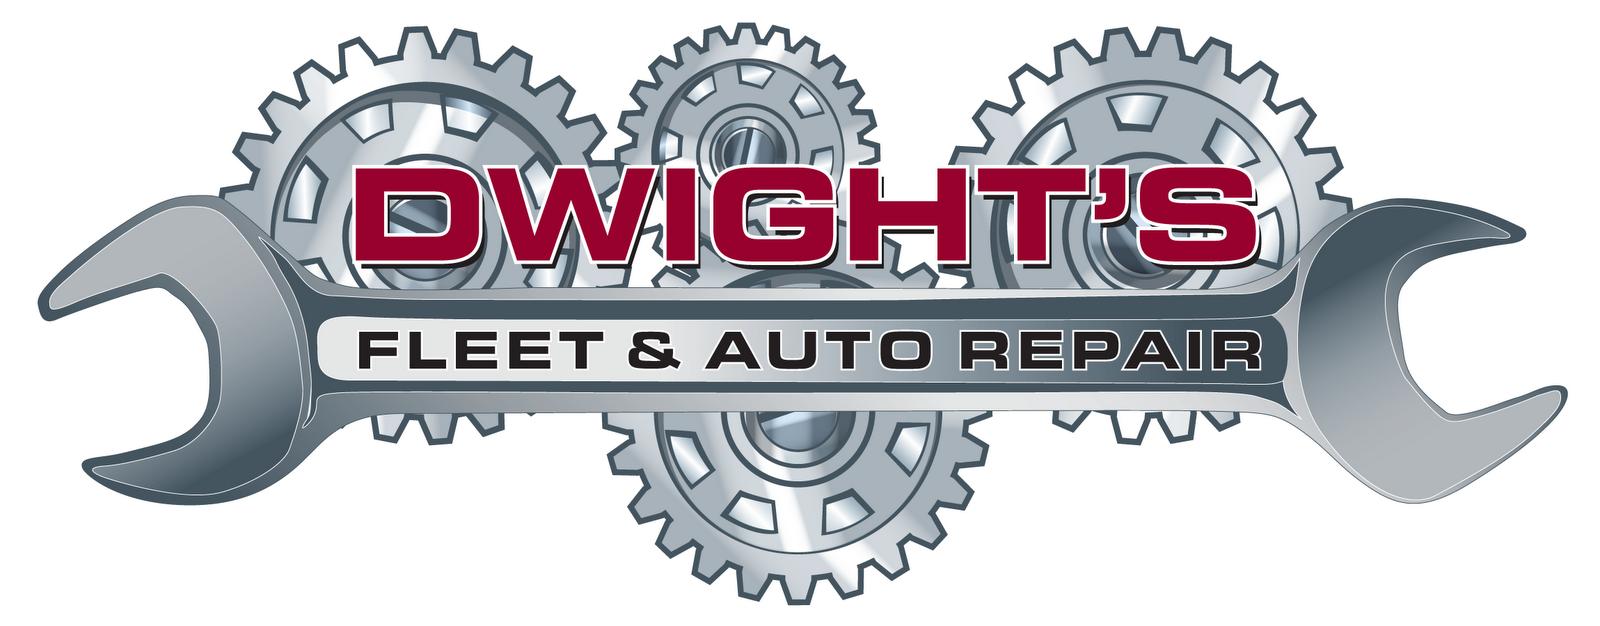 Automotive Logo Designs - Components Of Automotive Logo ...